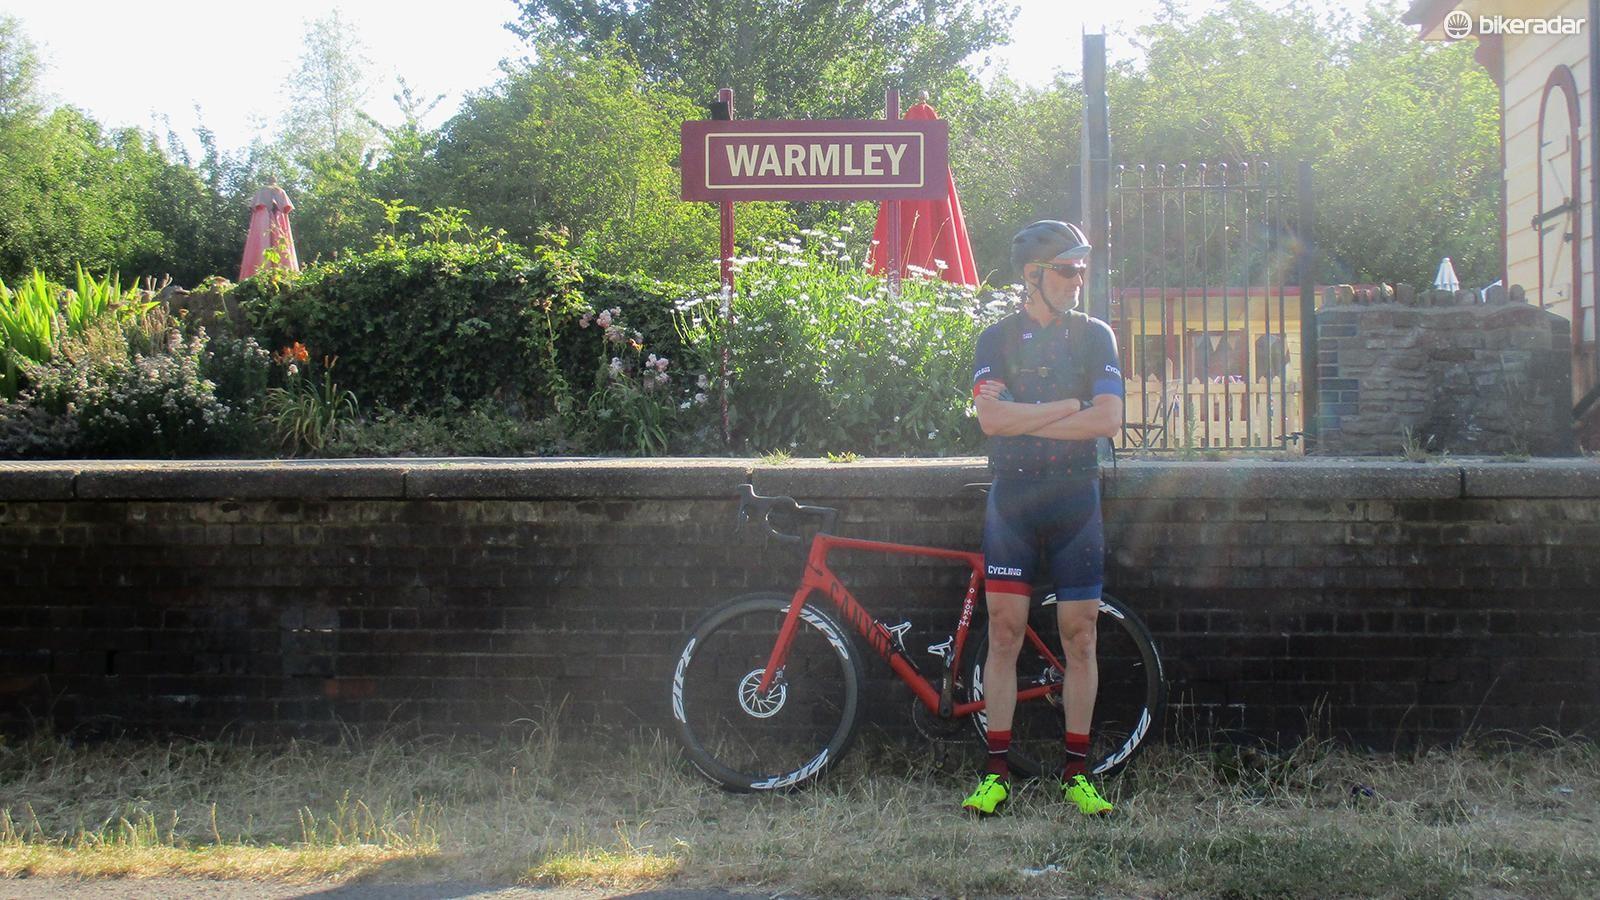 Rob Spedding, the commuting 1-percenter